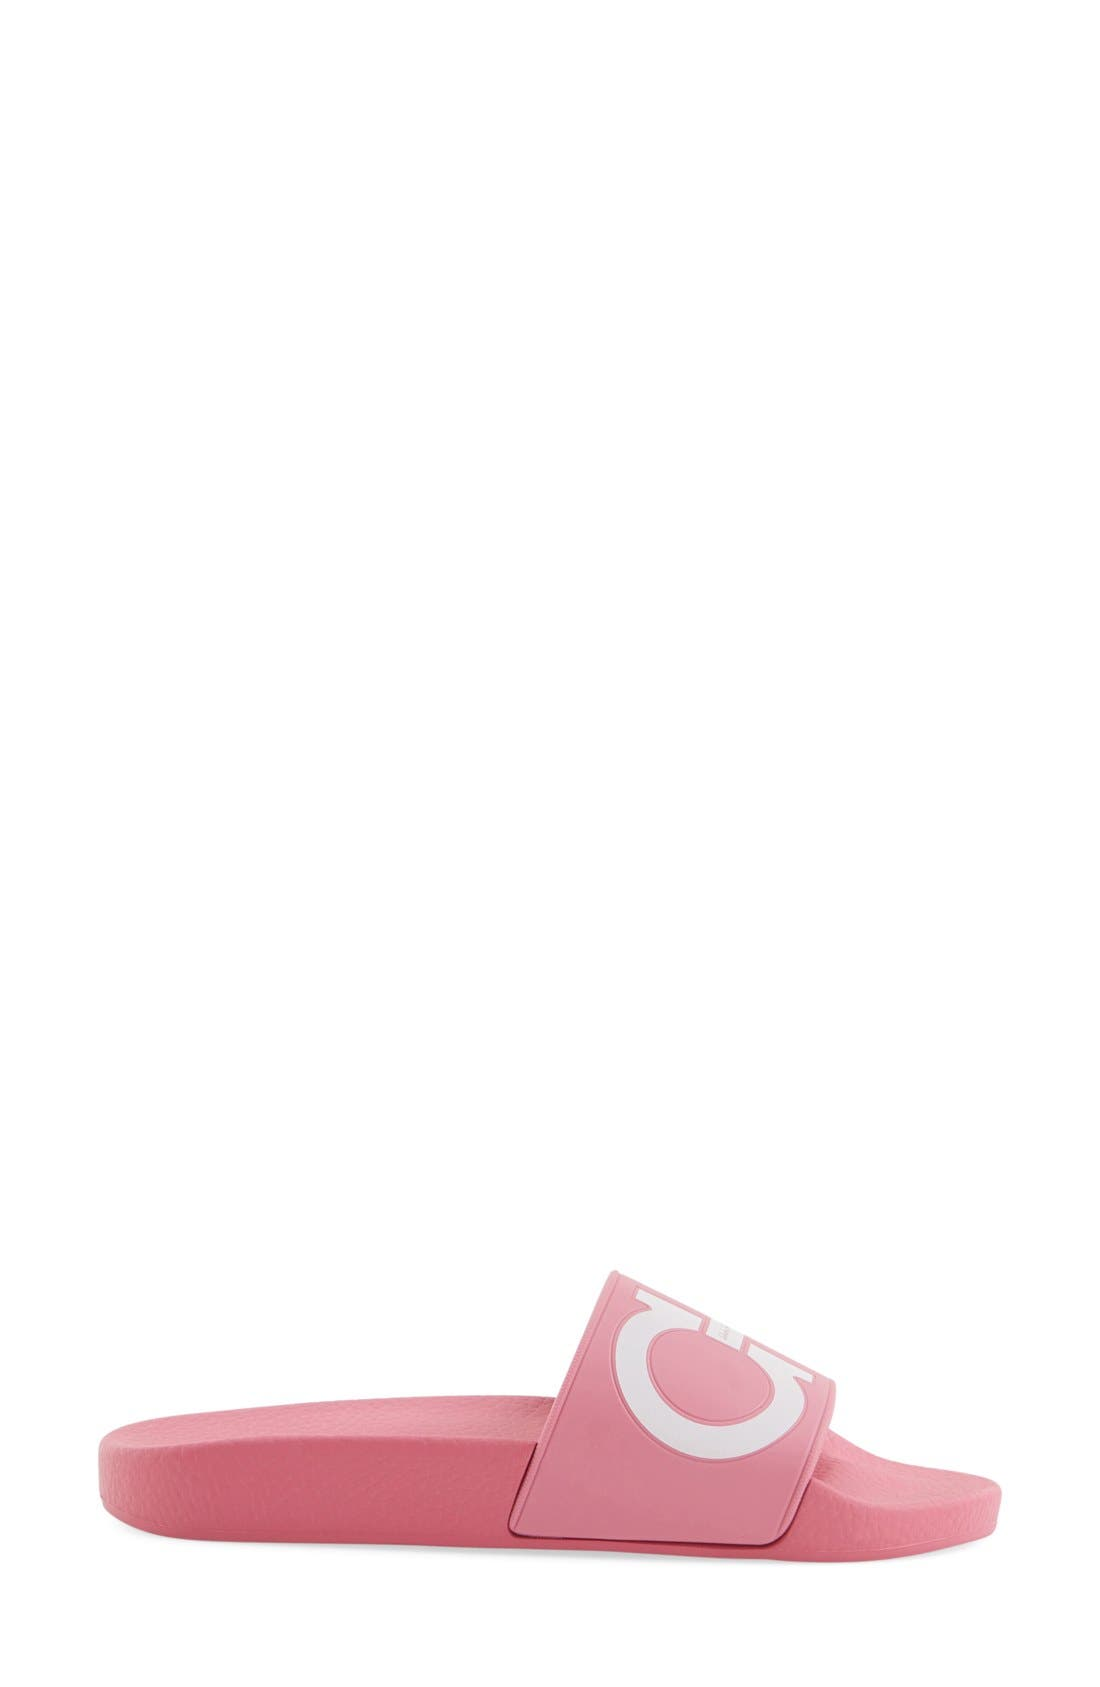 Groove Logo Slide Sandal,                             Alternate thumbnail 4, color,                             Bubble Gum Pink/ White